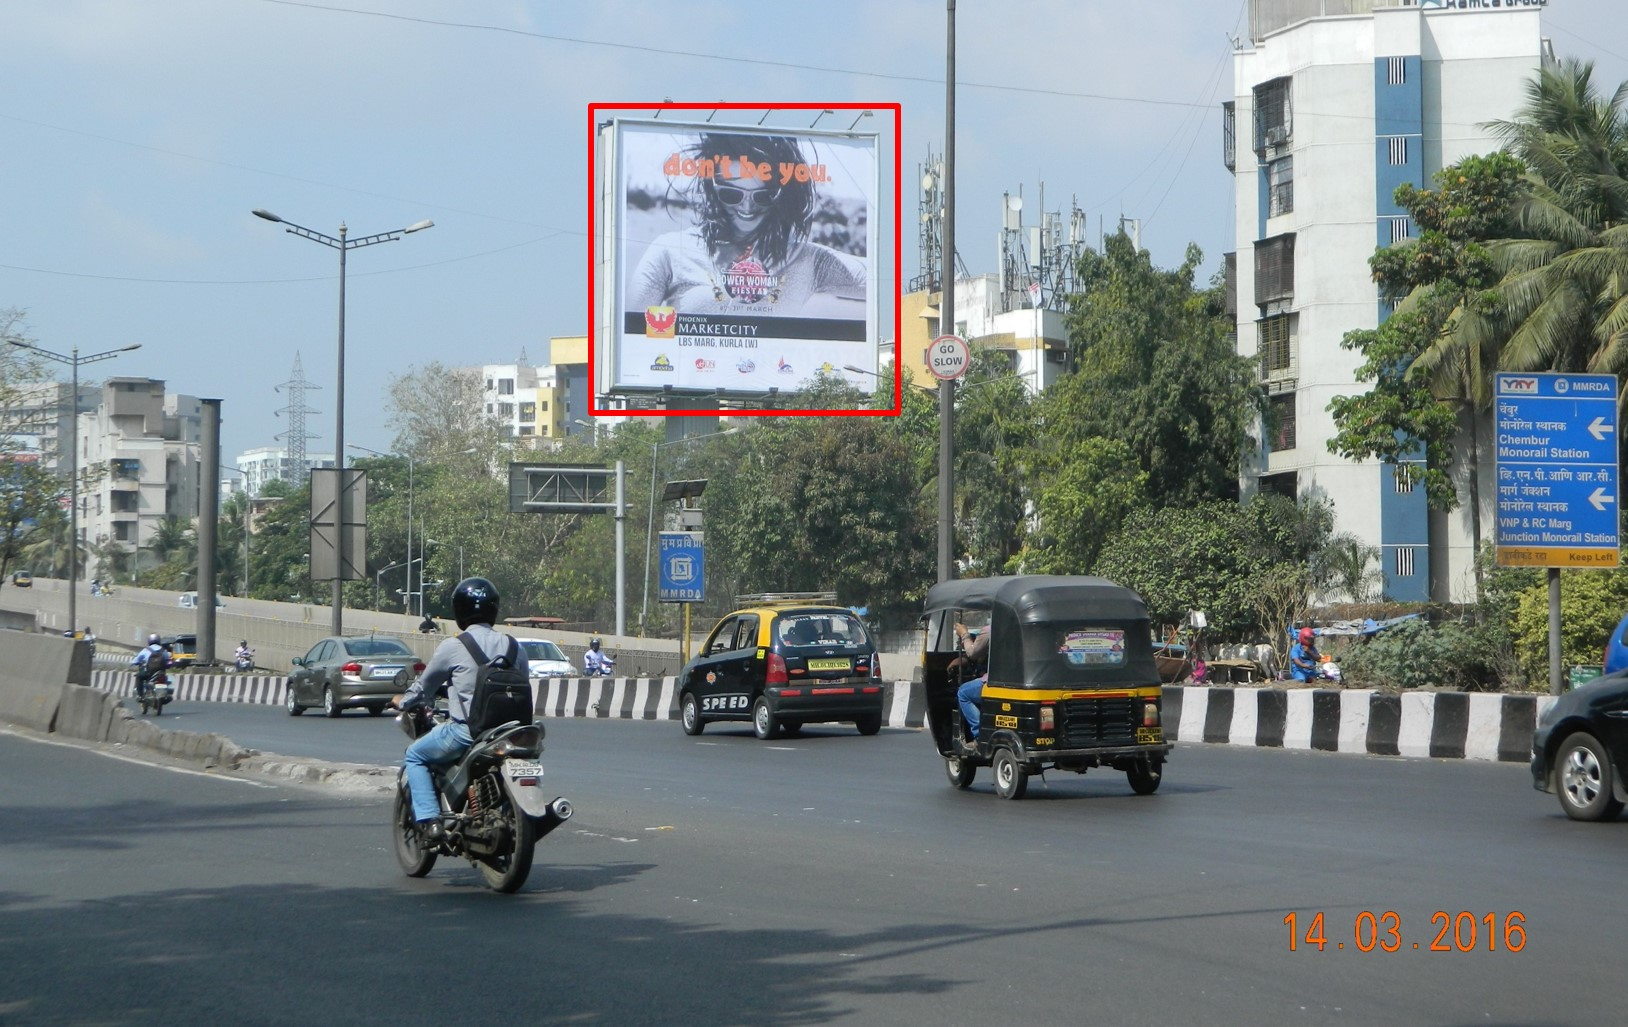 Ghatkopar Amar Mahal MT, Mumbai